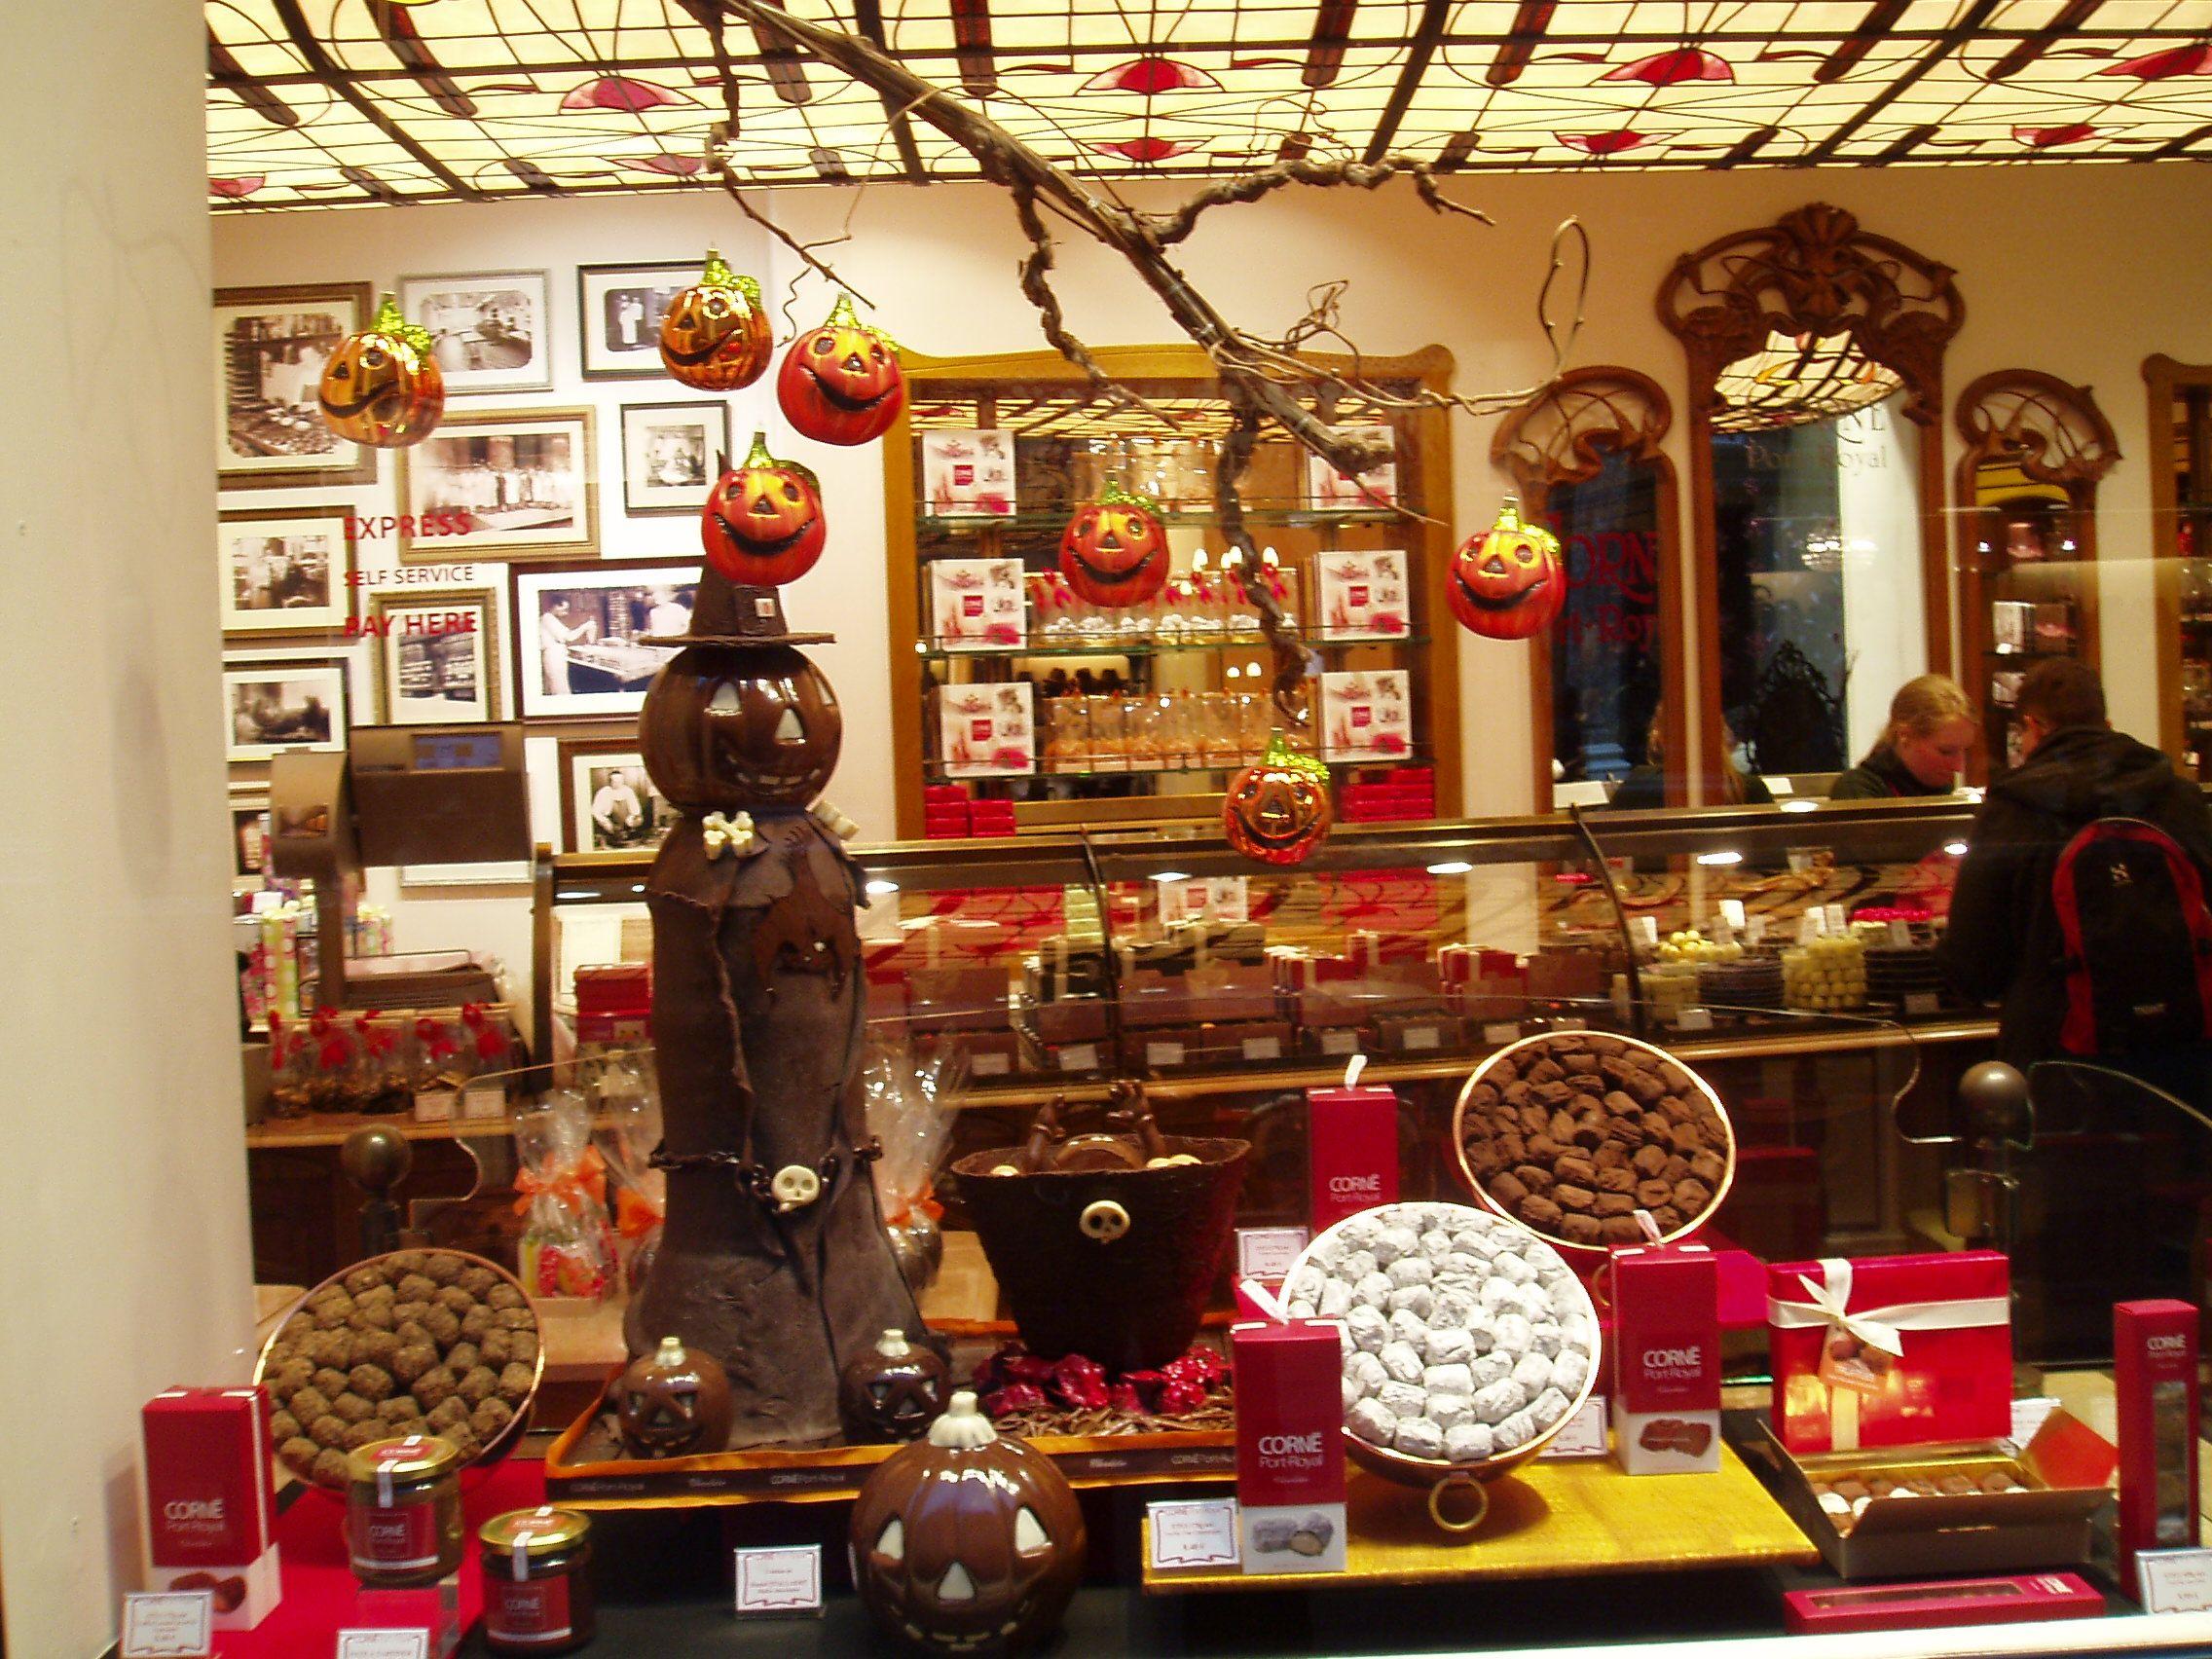 Chocolate Shop   Chocolate Everything   Pinterest   Chocolate shop ...